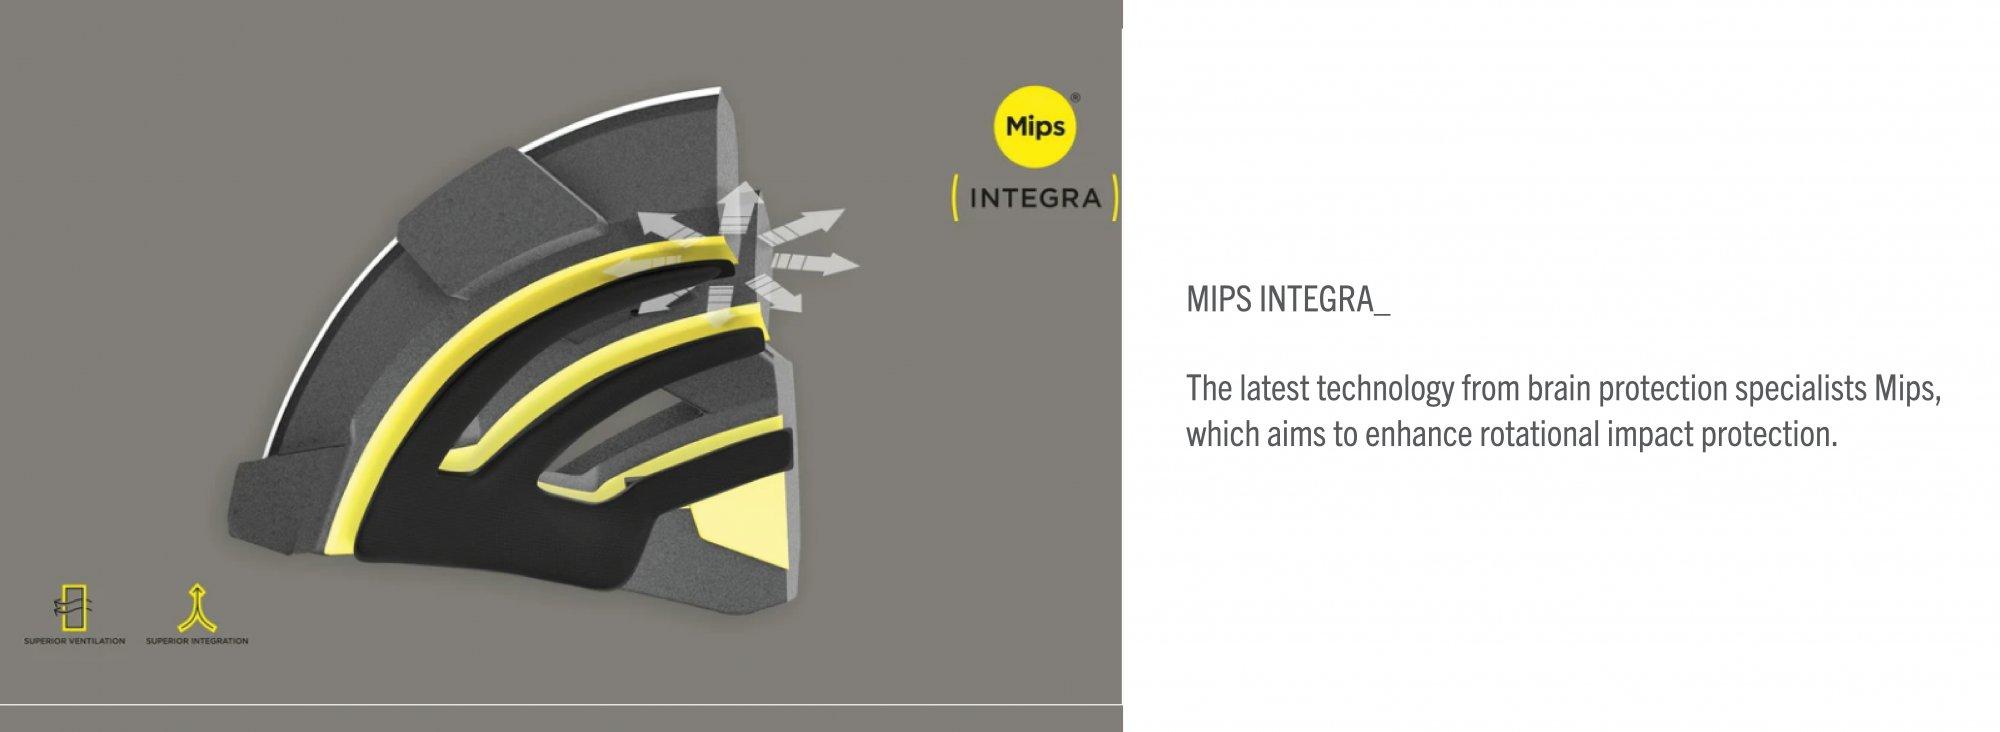 Kortal Race - Mips Integra